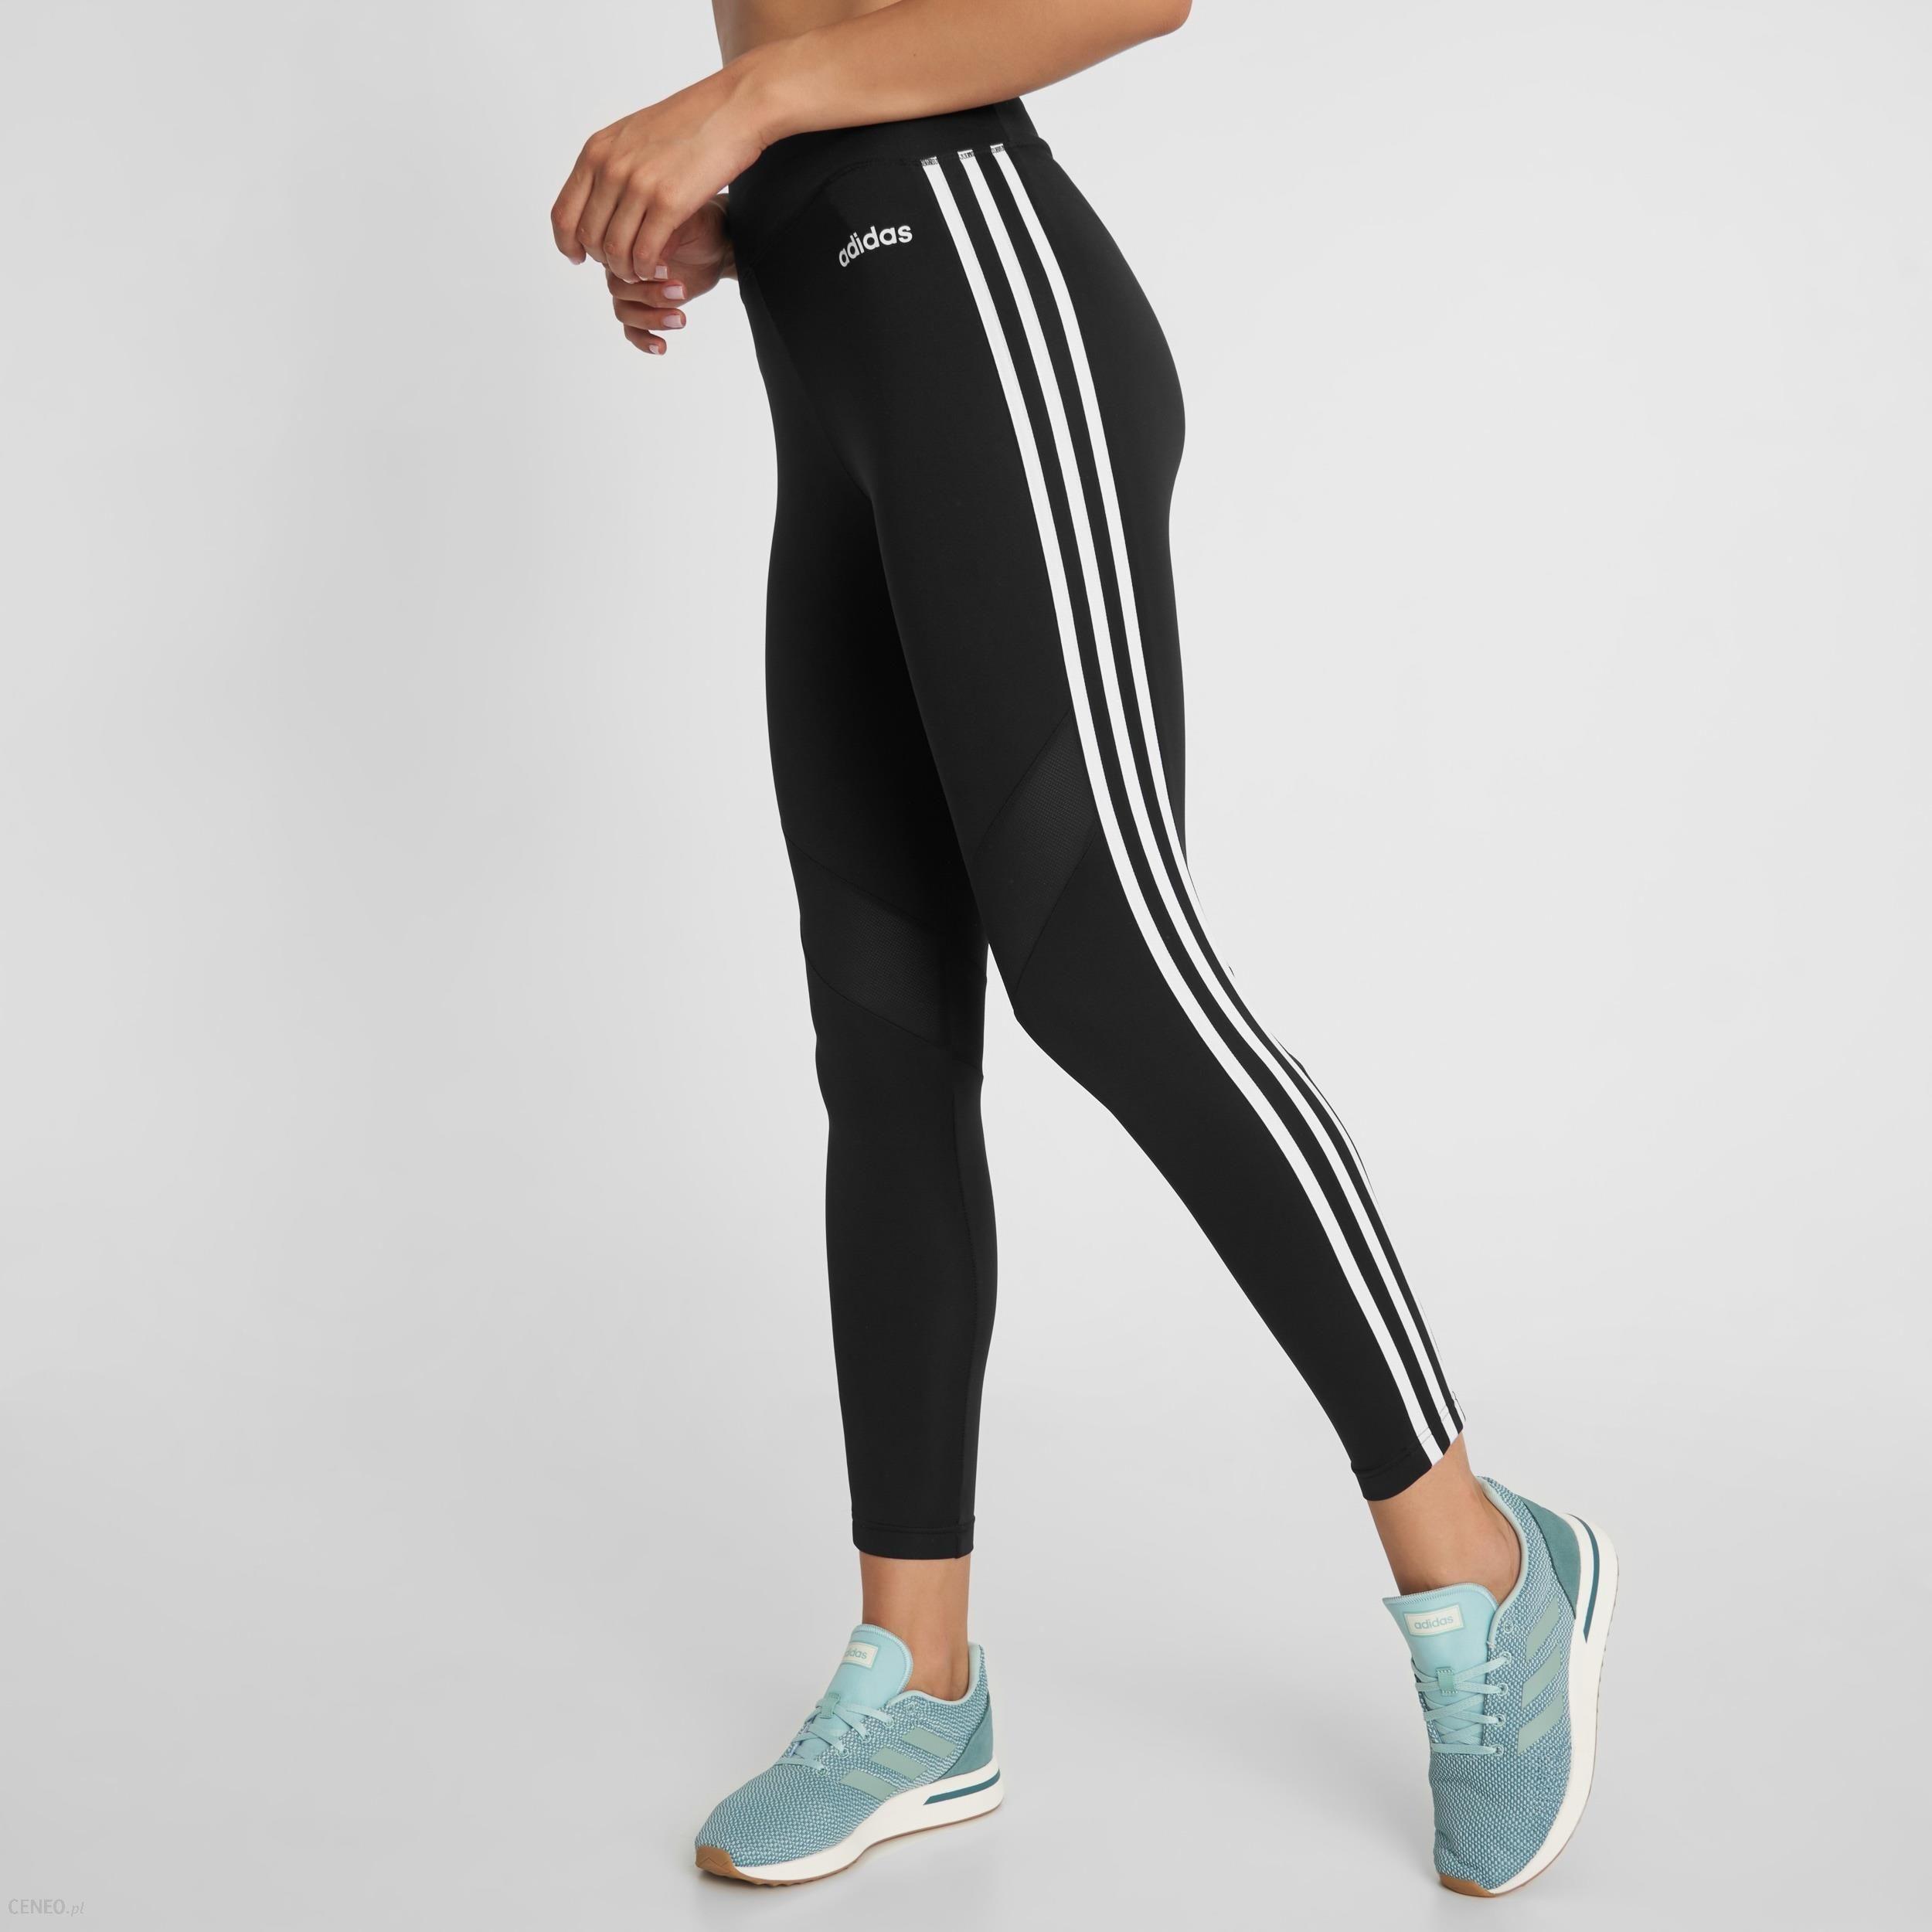 Damskie spodnie XPR TIGHT EI5495 ADIDAS